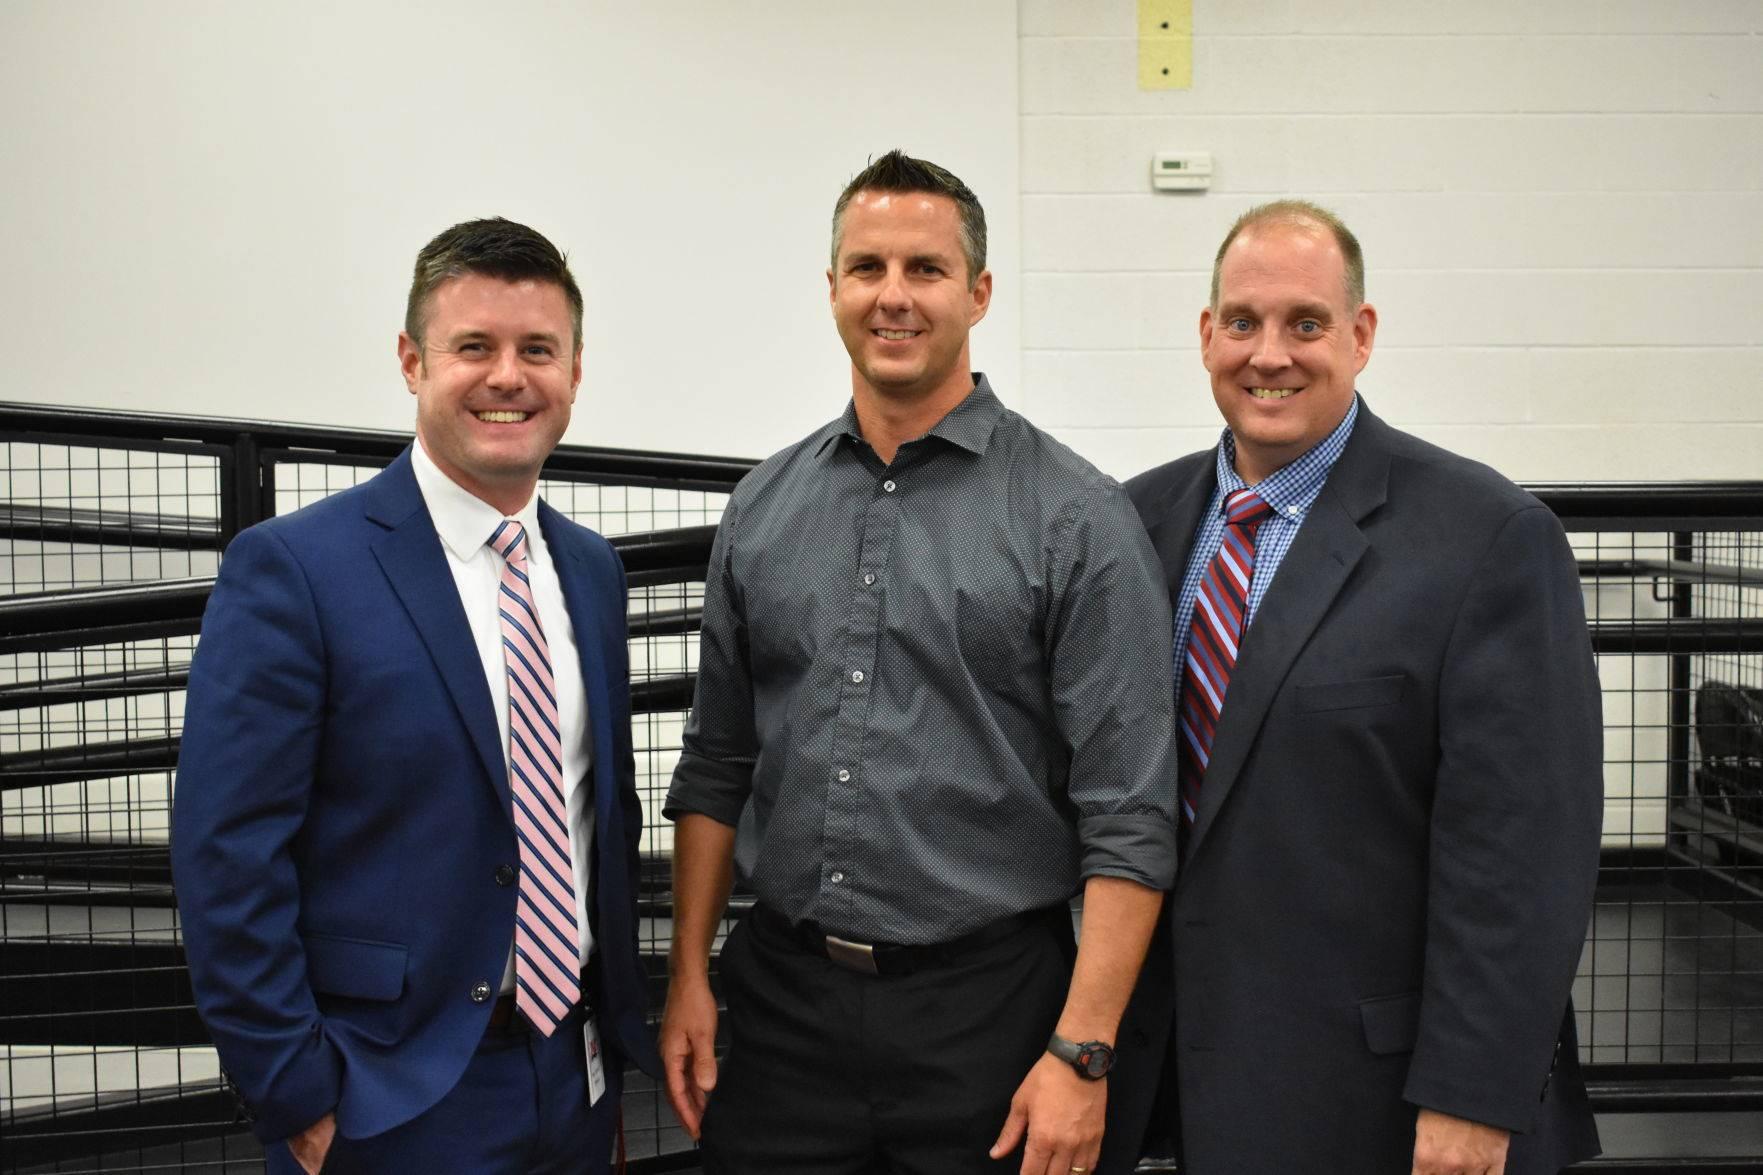 Mr. Oswald, Mr. Sackett, and Mr. Morris